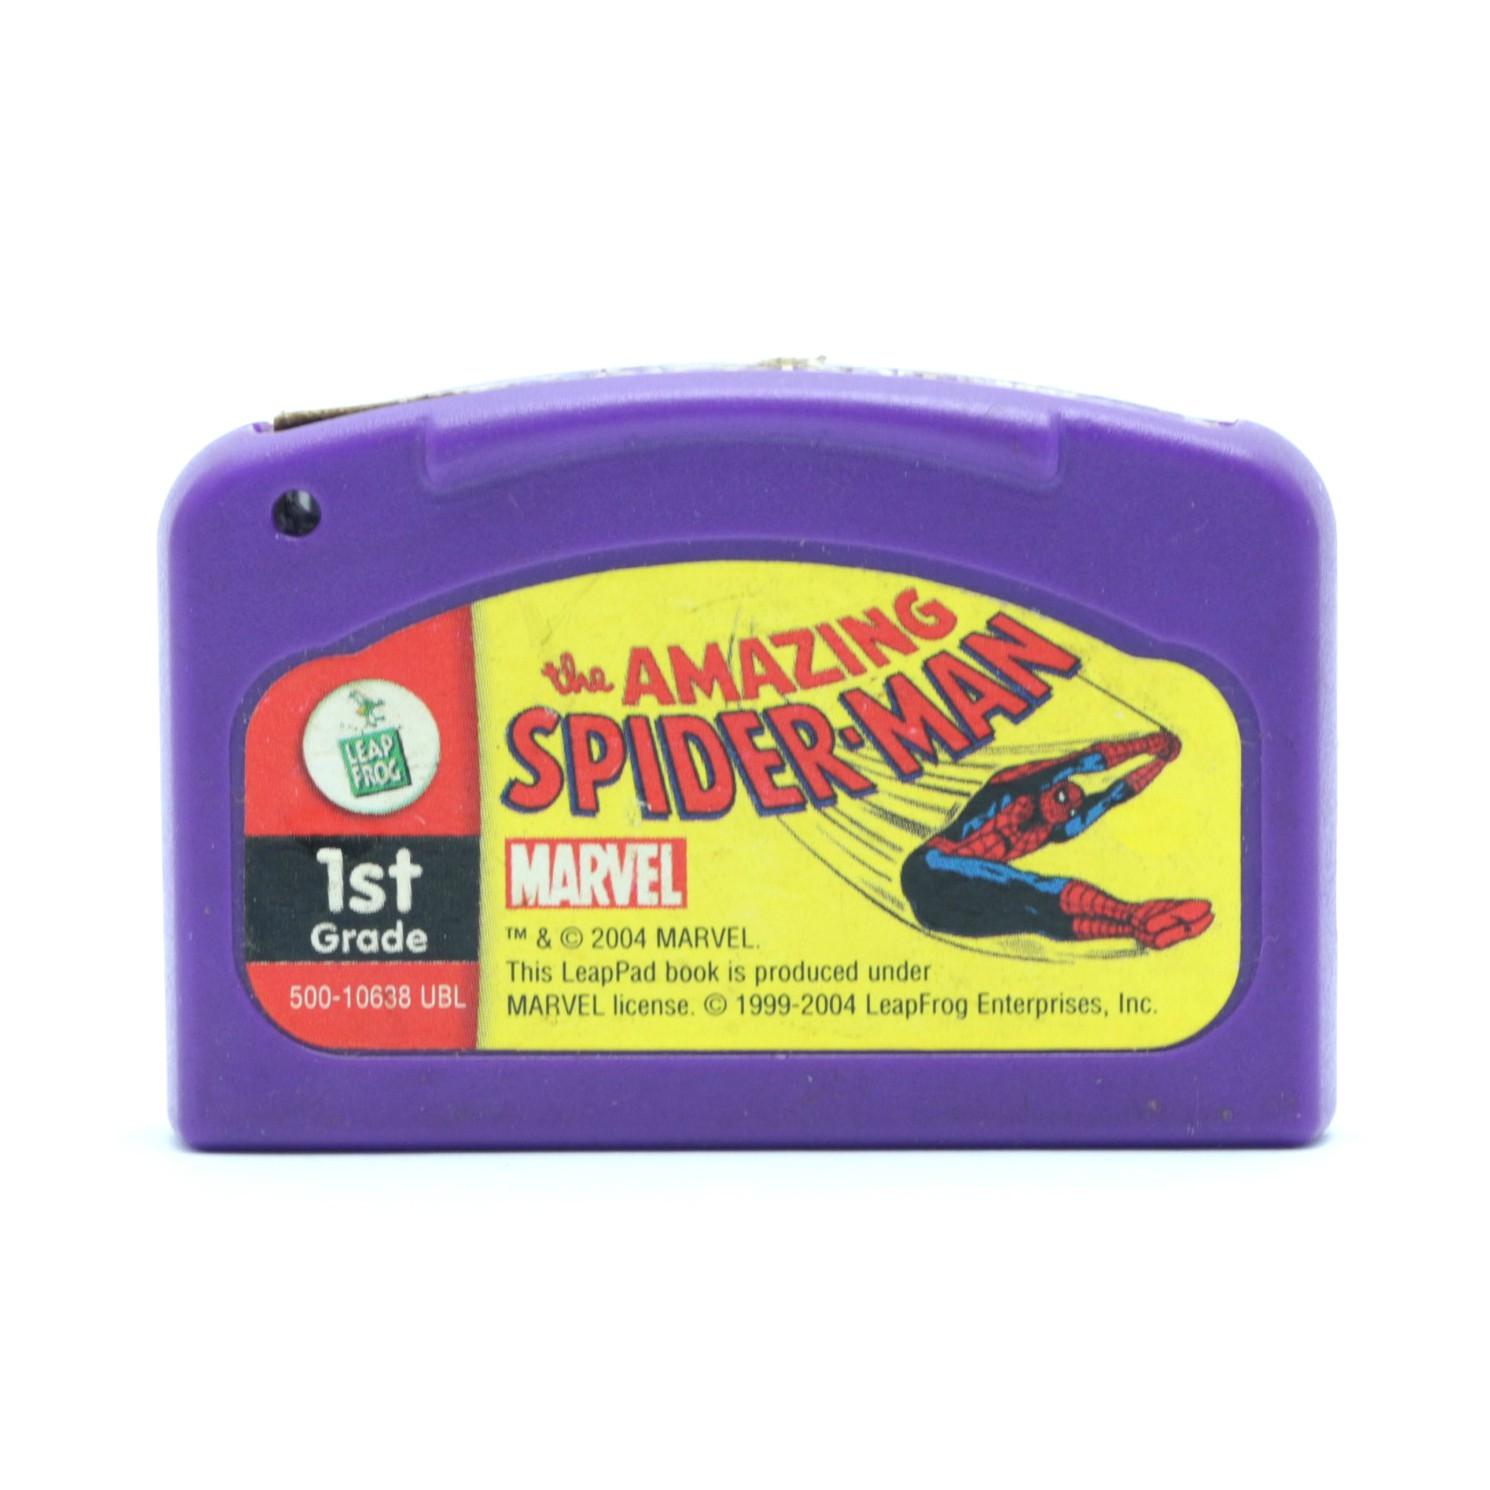 LeapPad 1st Grade The Amazing Spider-Man